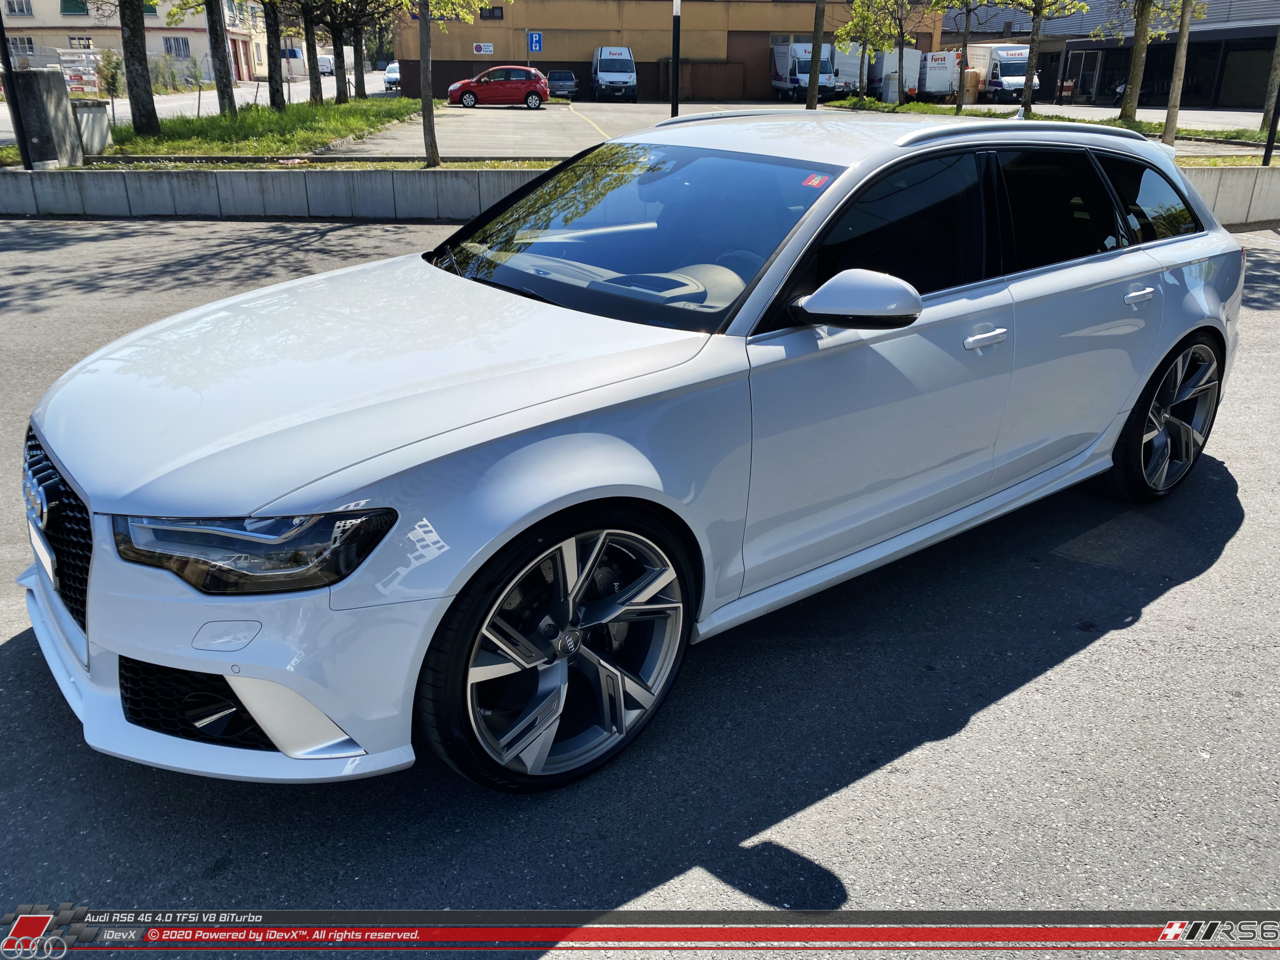 24.04.2020_Audi-RS6_iDevX_001.png